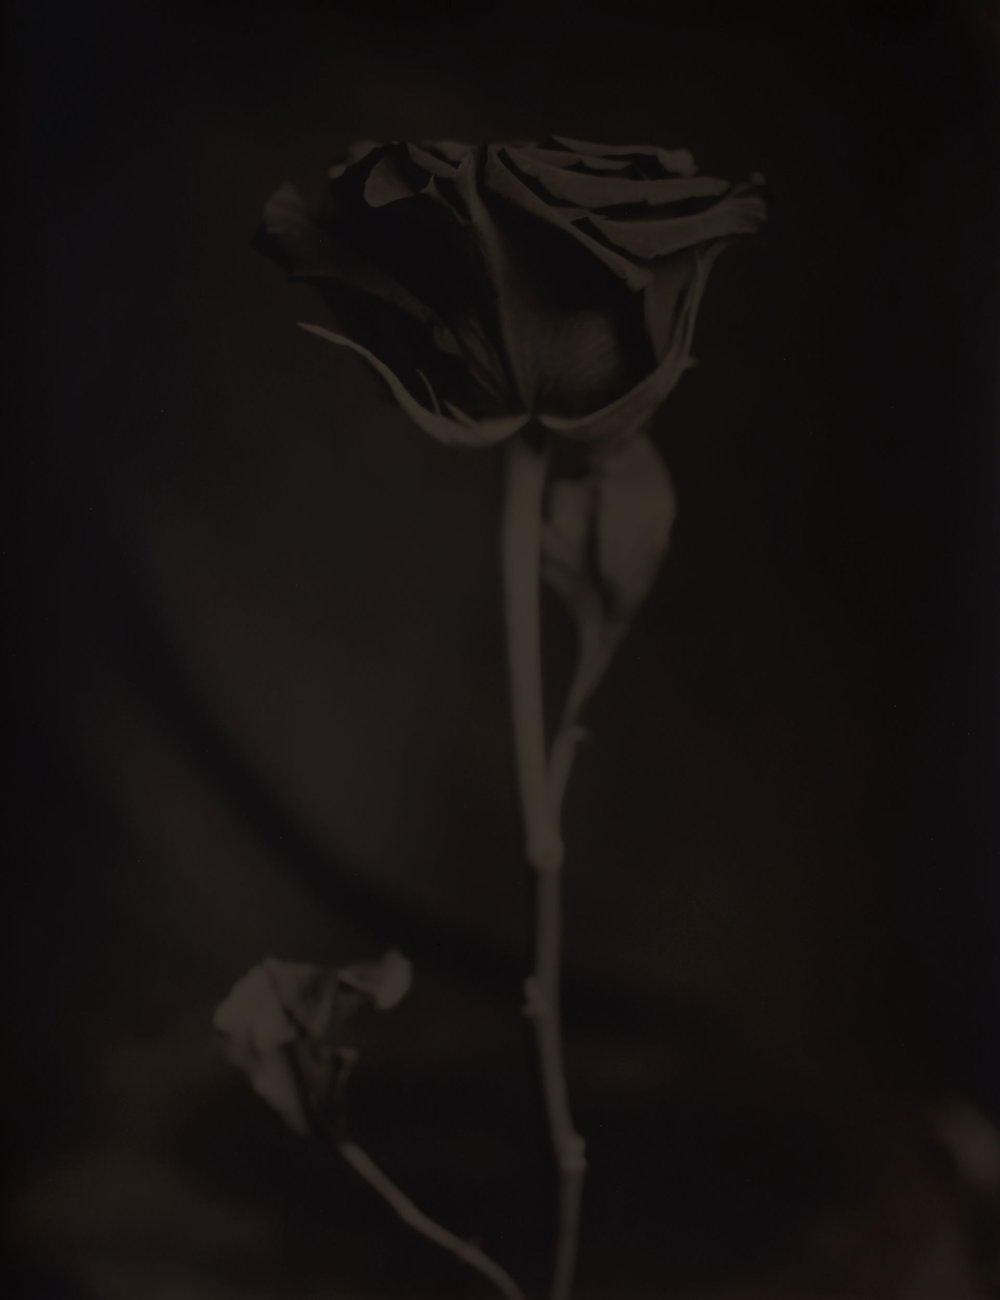 Rose, 2016Gelatin Silver Print, 24 x 20 in.